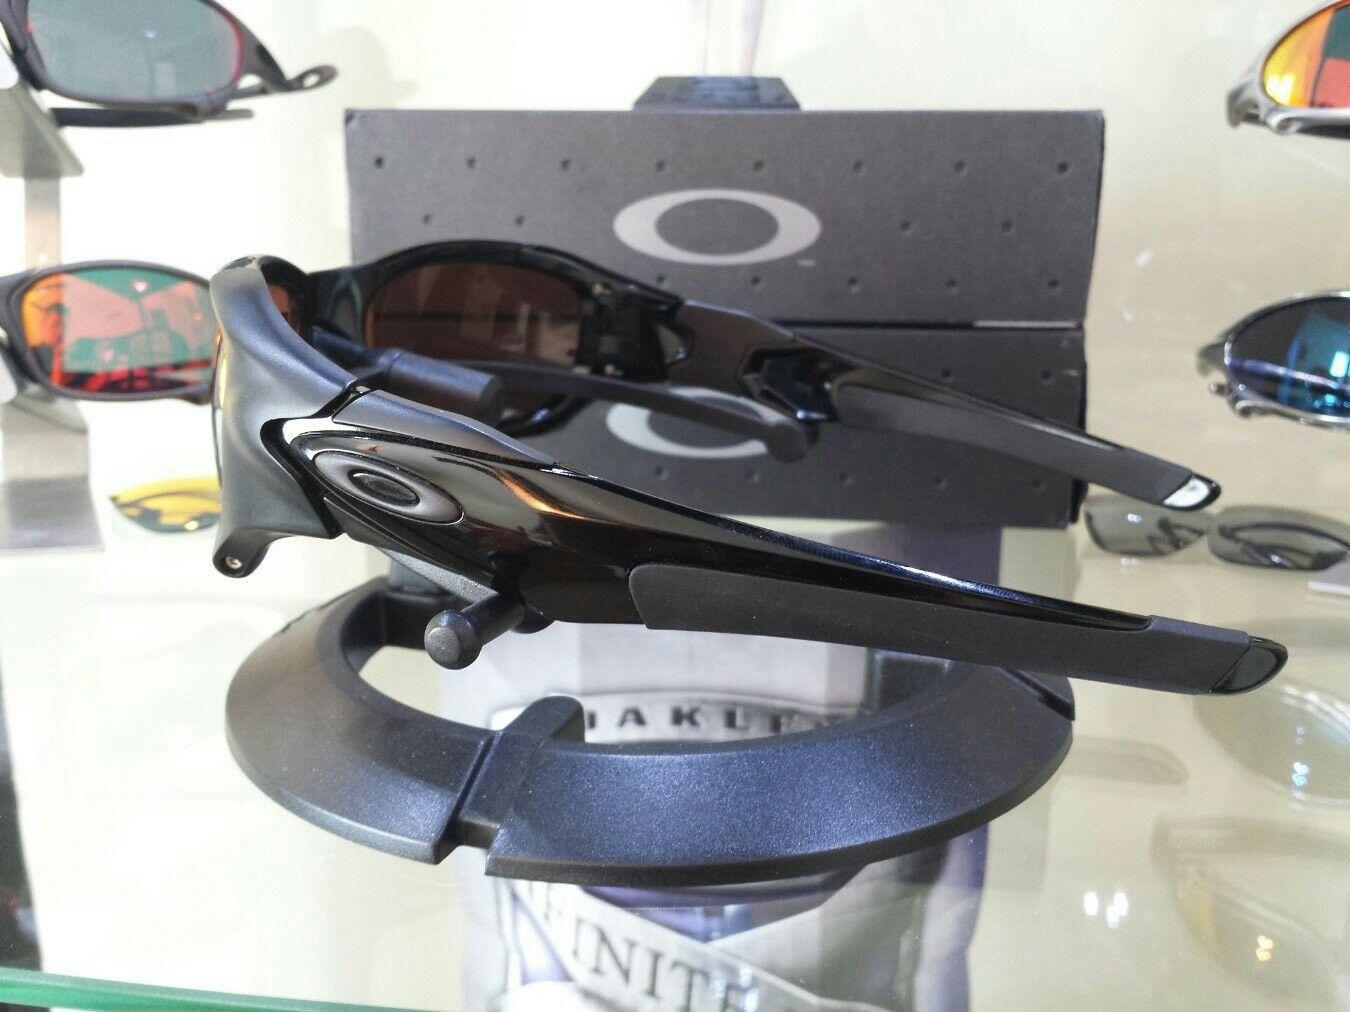 Oakley Pit Boss II - $275 - e9equdeg.jpg